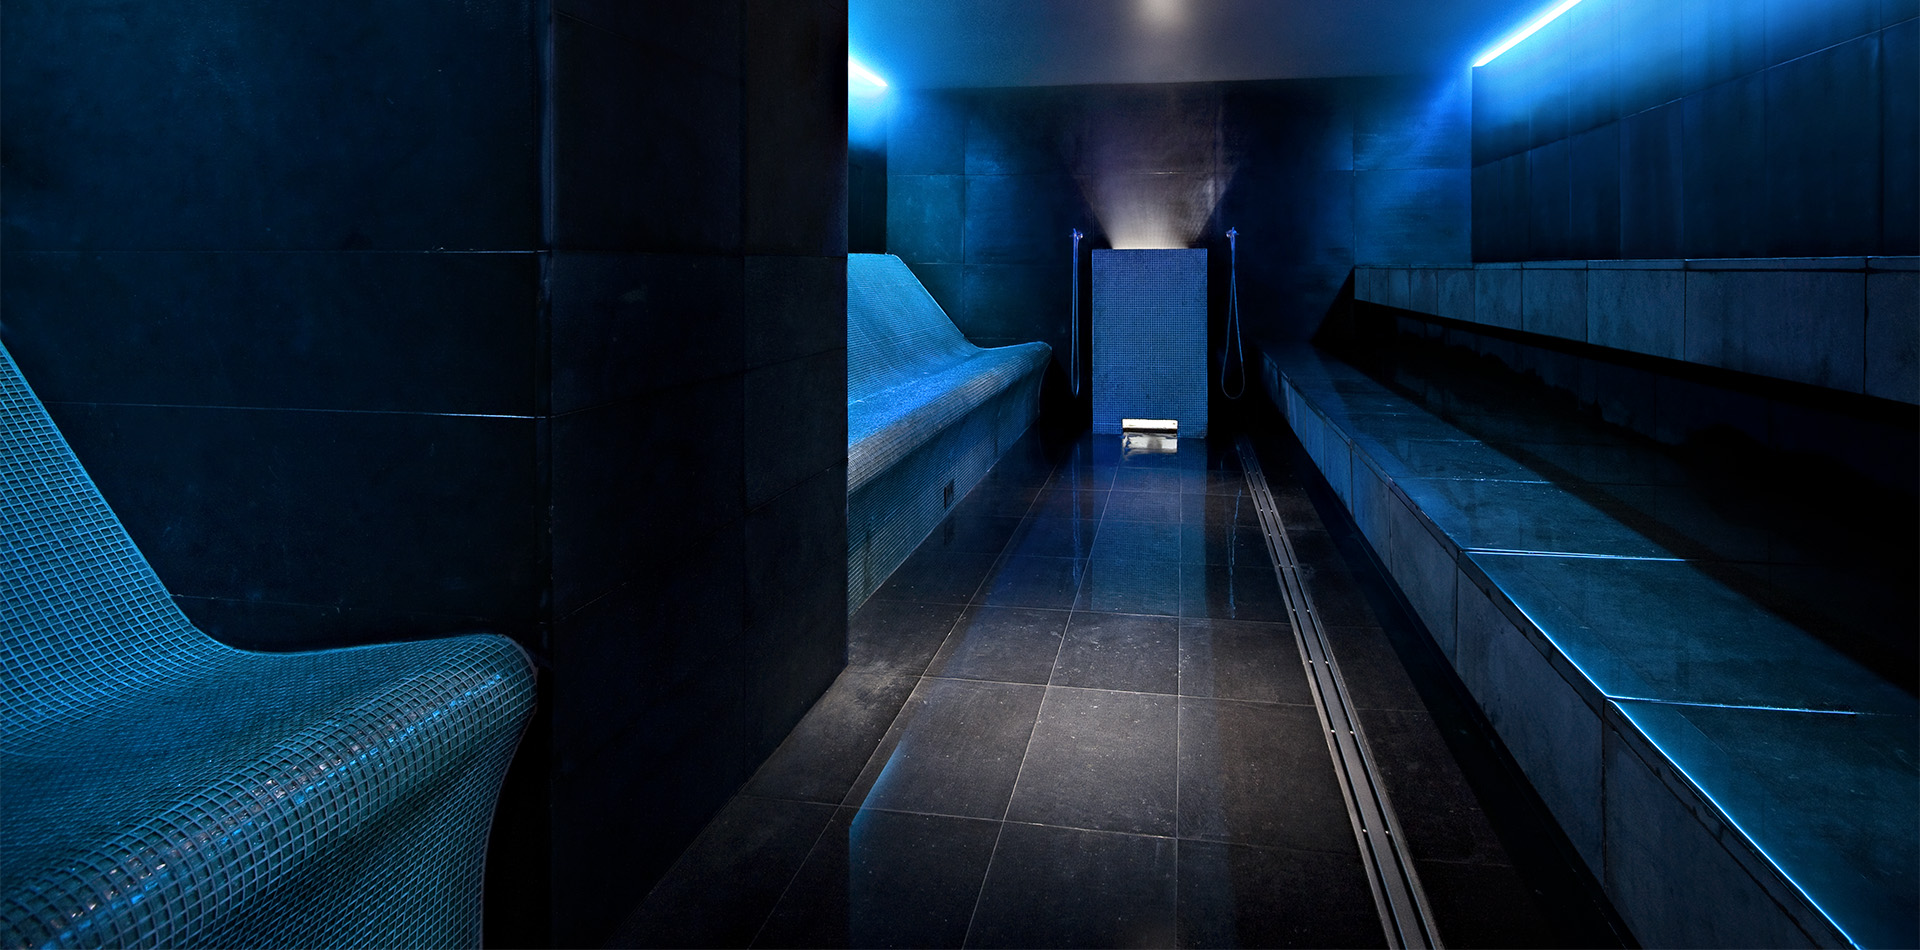 bagno di vapore ASSP 5